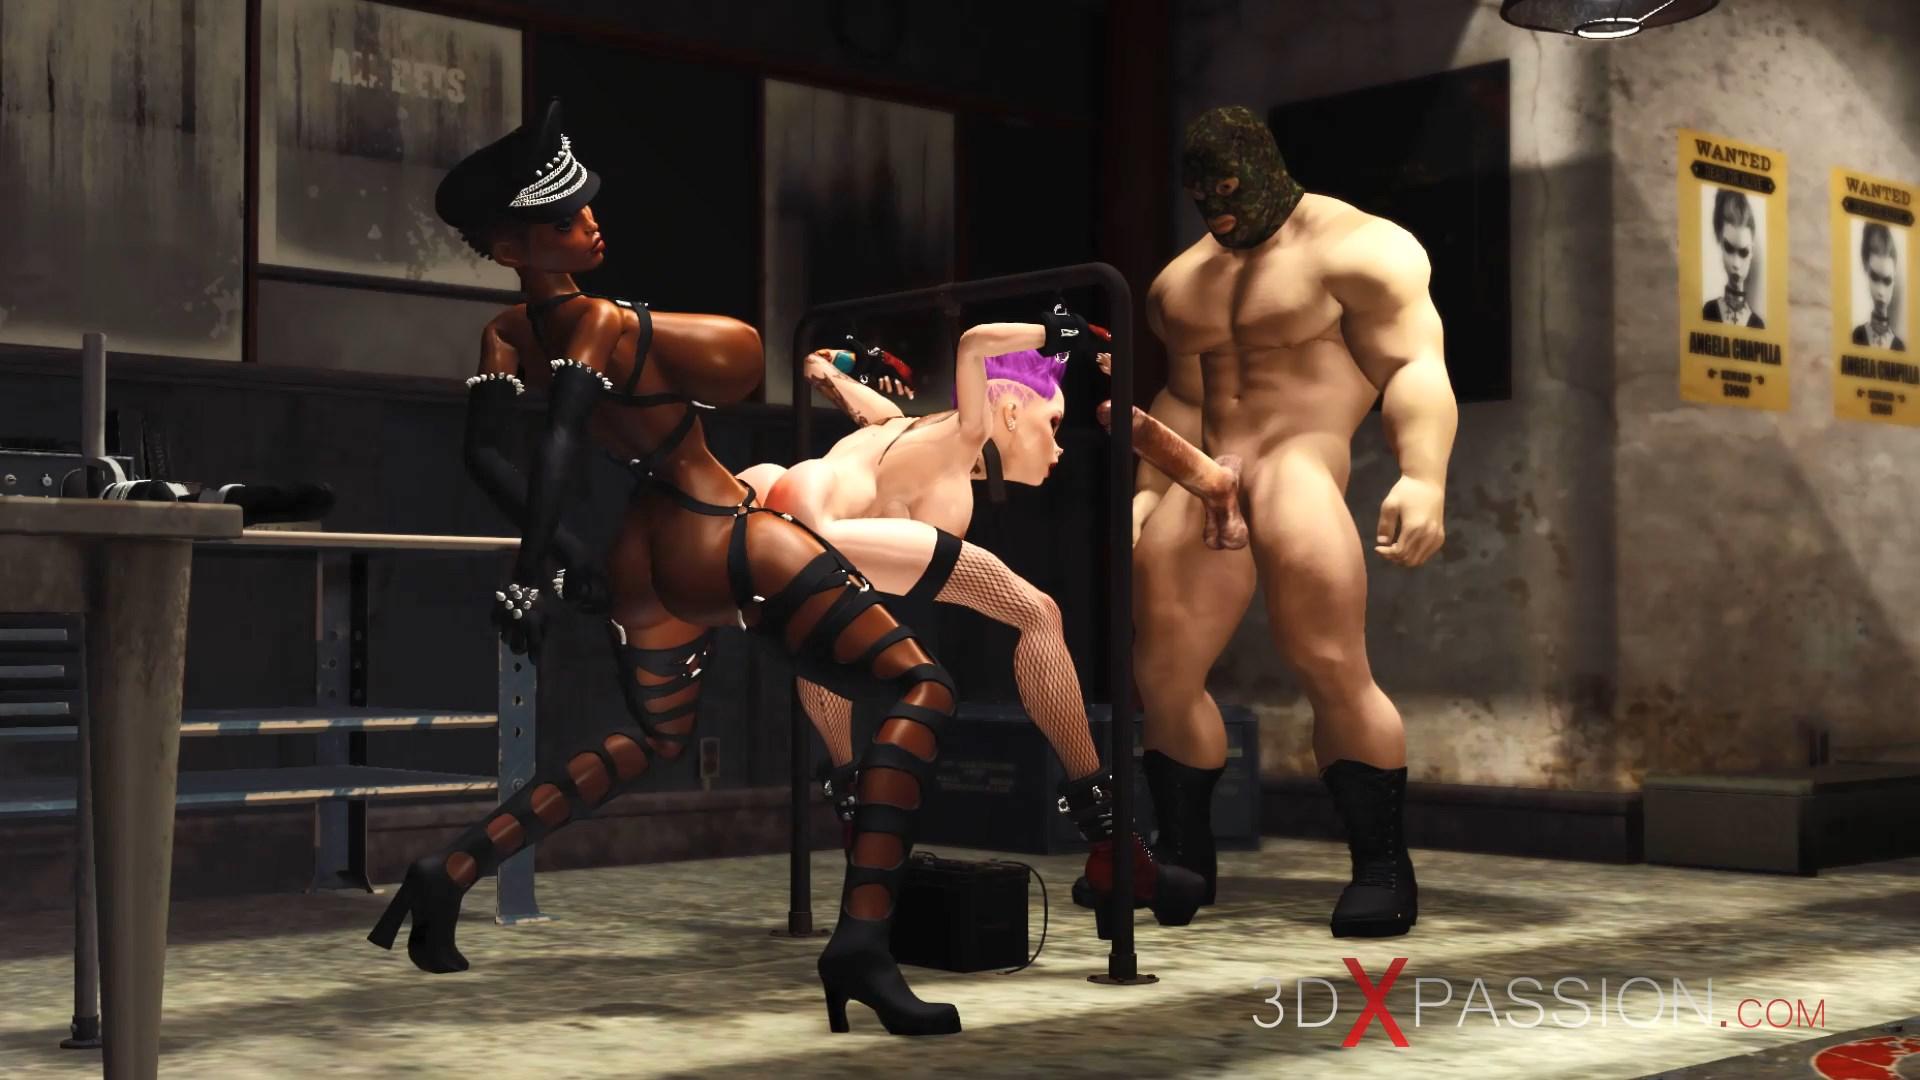 Super hot sexy Fuck machine, BDSM, hardcore, gangbang and double penetration doggystyle